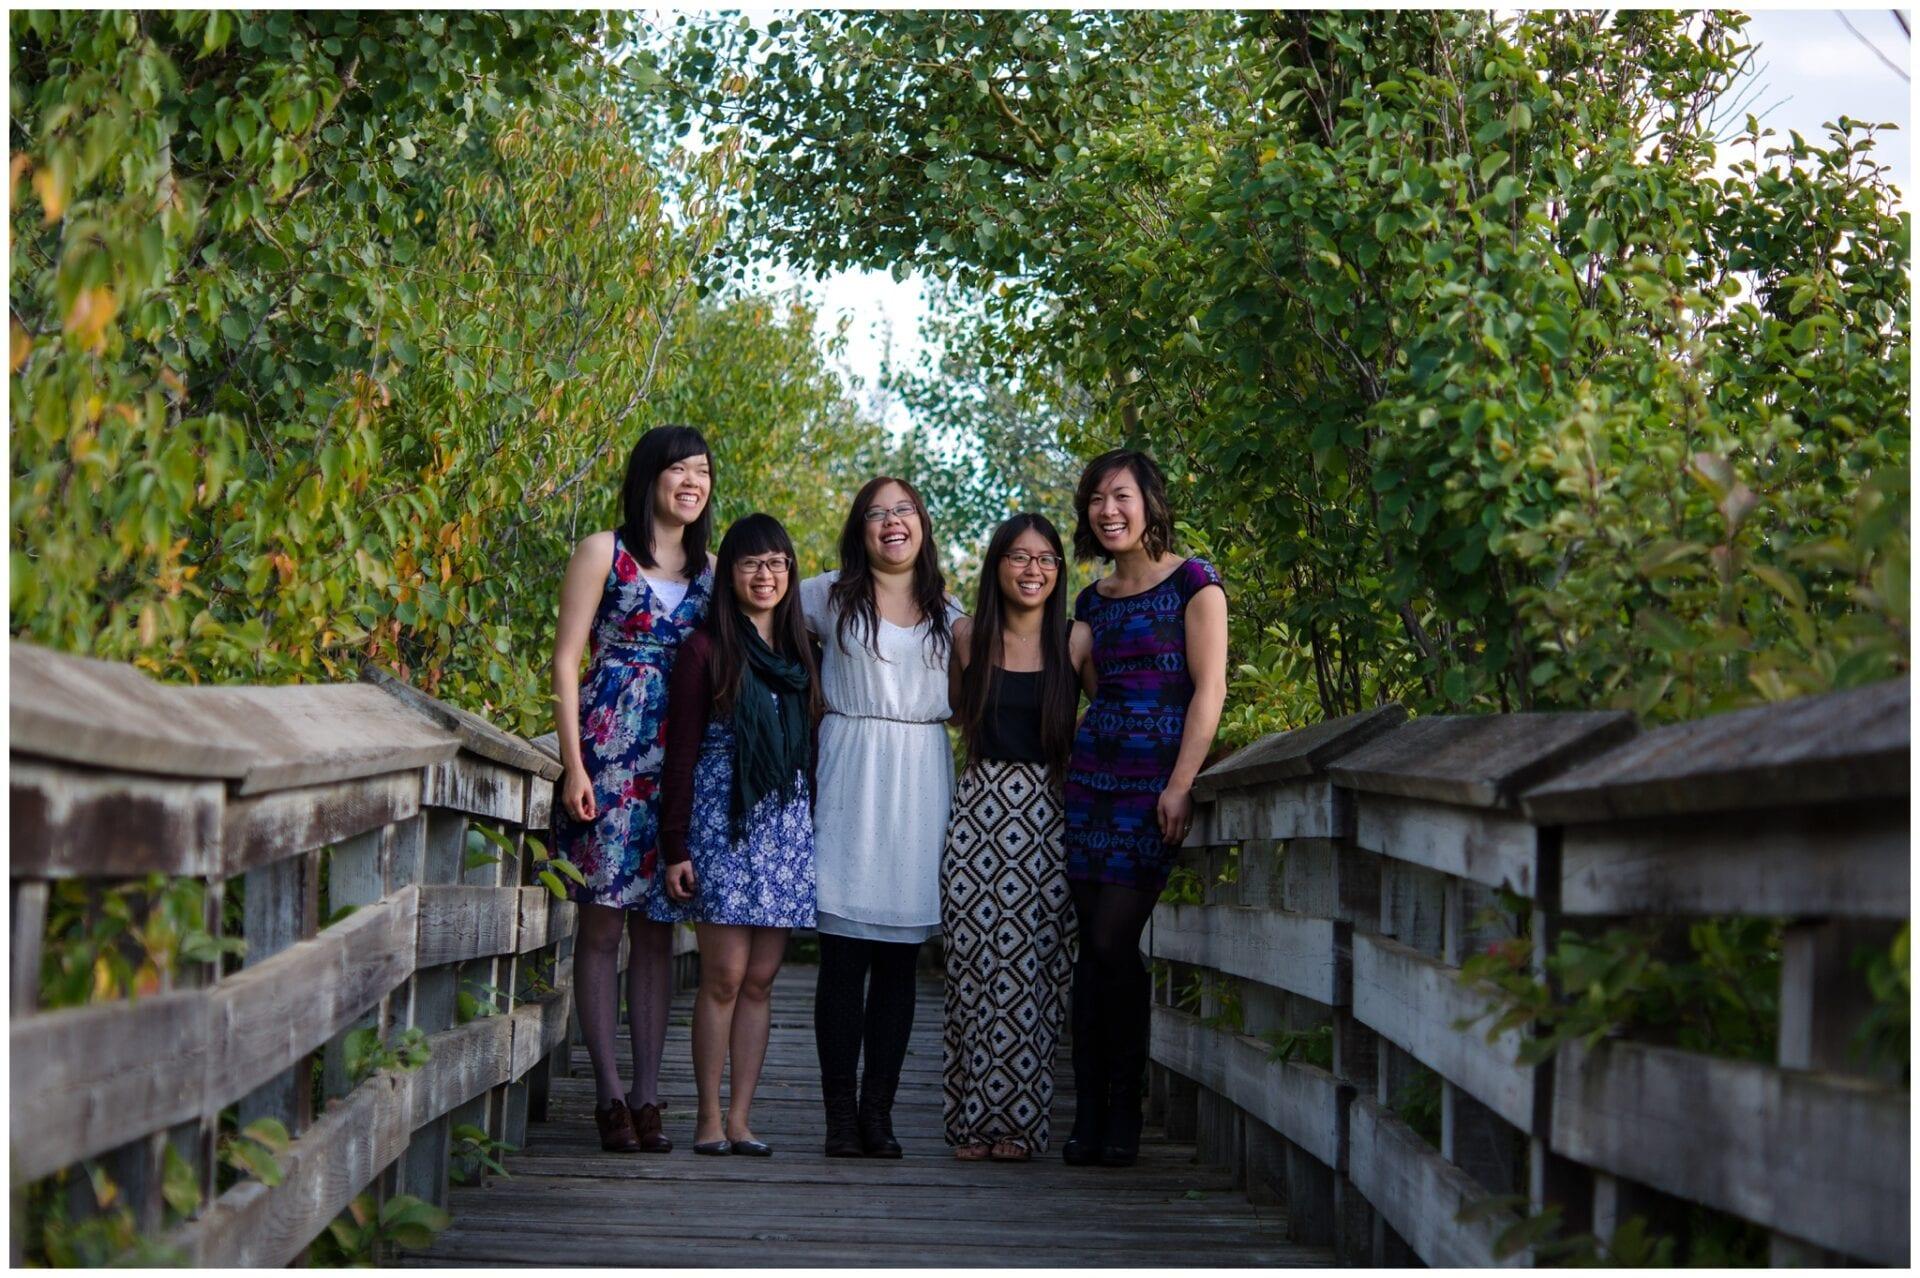 Sherwood Park Edmonton-bridesmaid-Photography-021